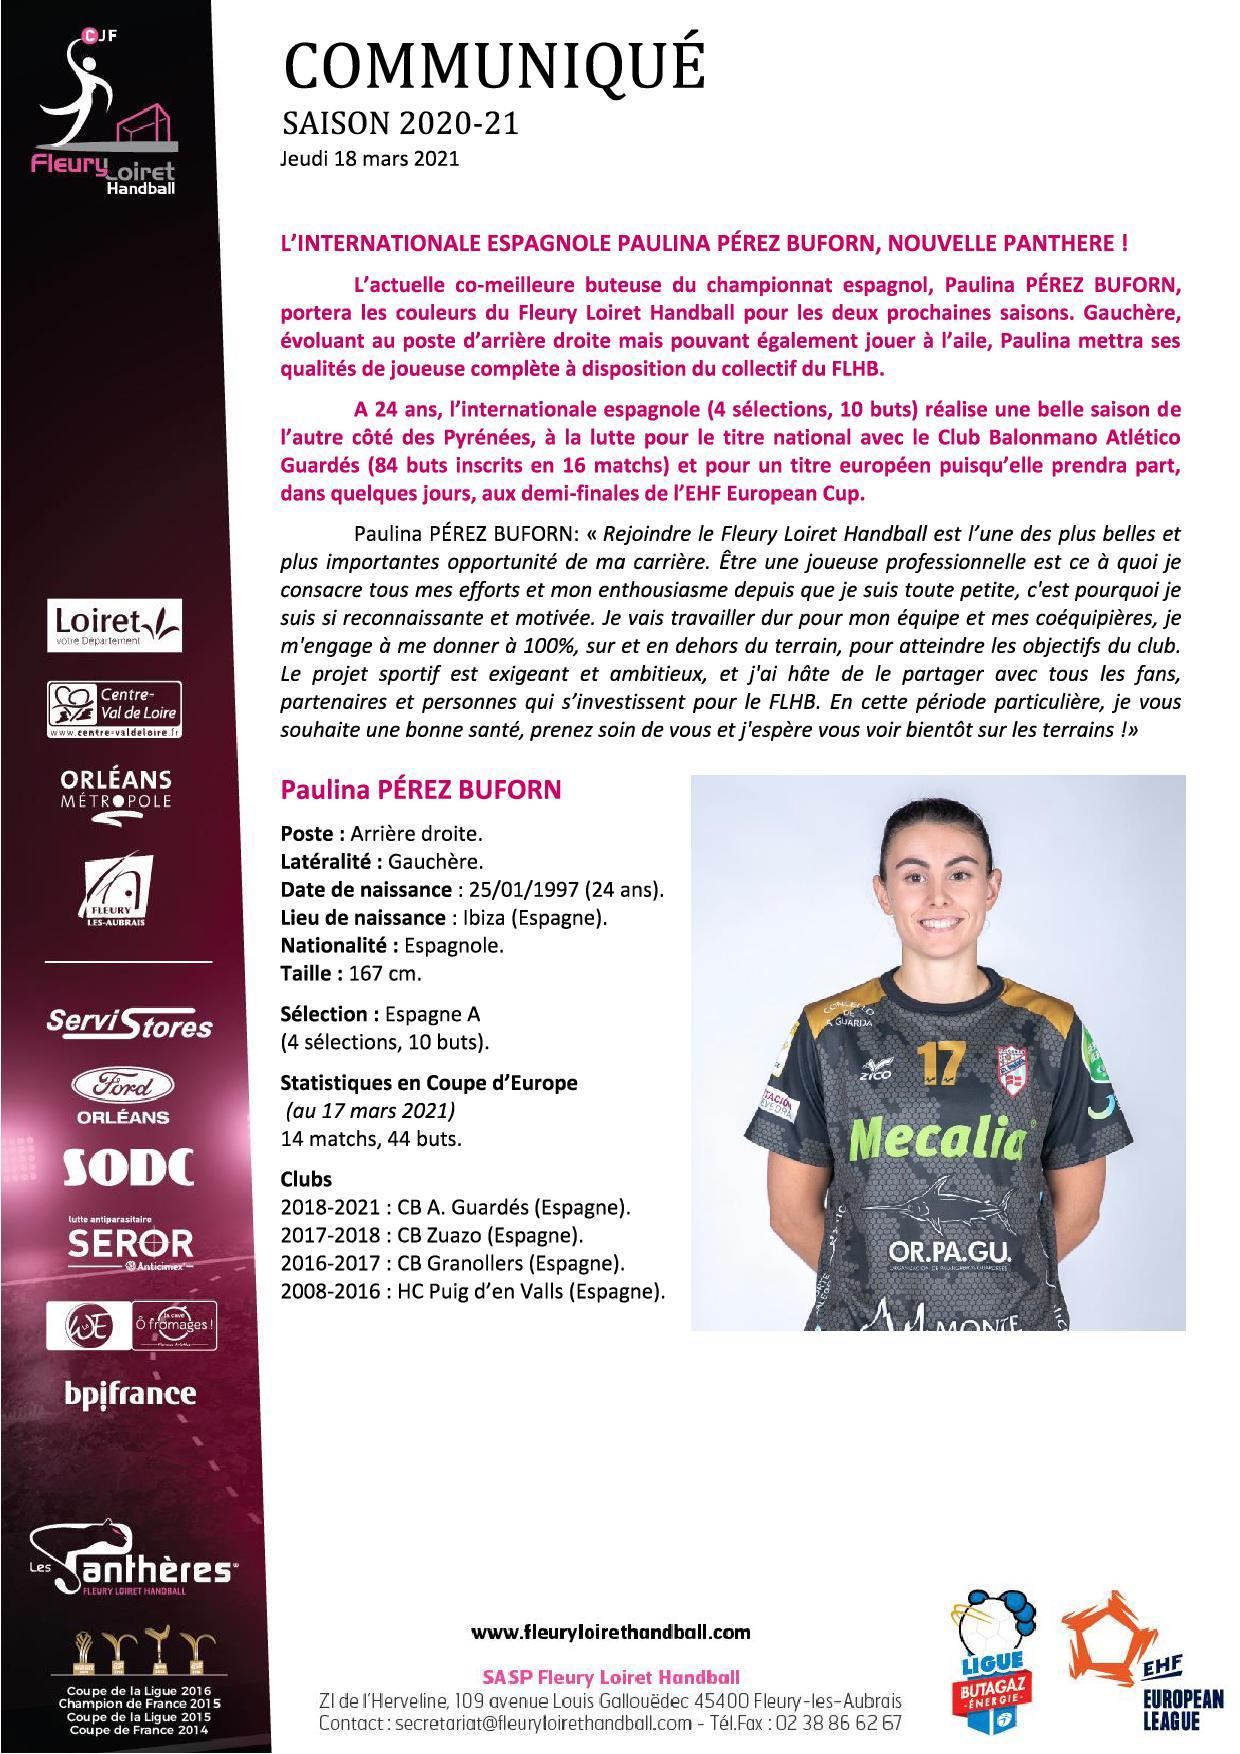 Communiqué Fleury Loiret Handball - Jeudi 18 mars 2021.jpg